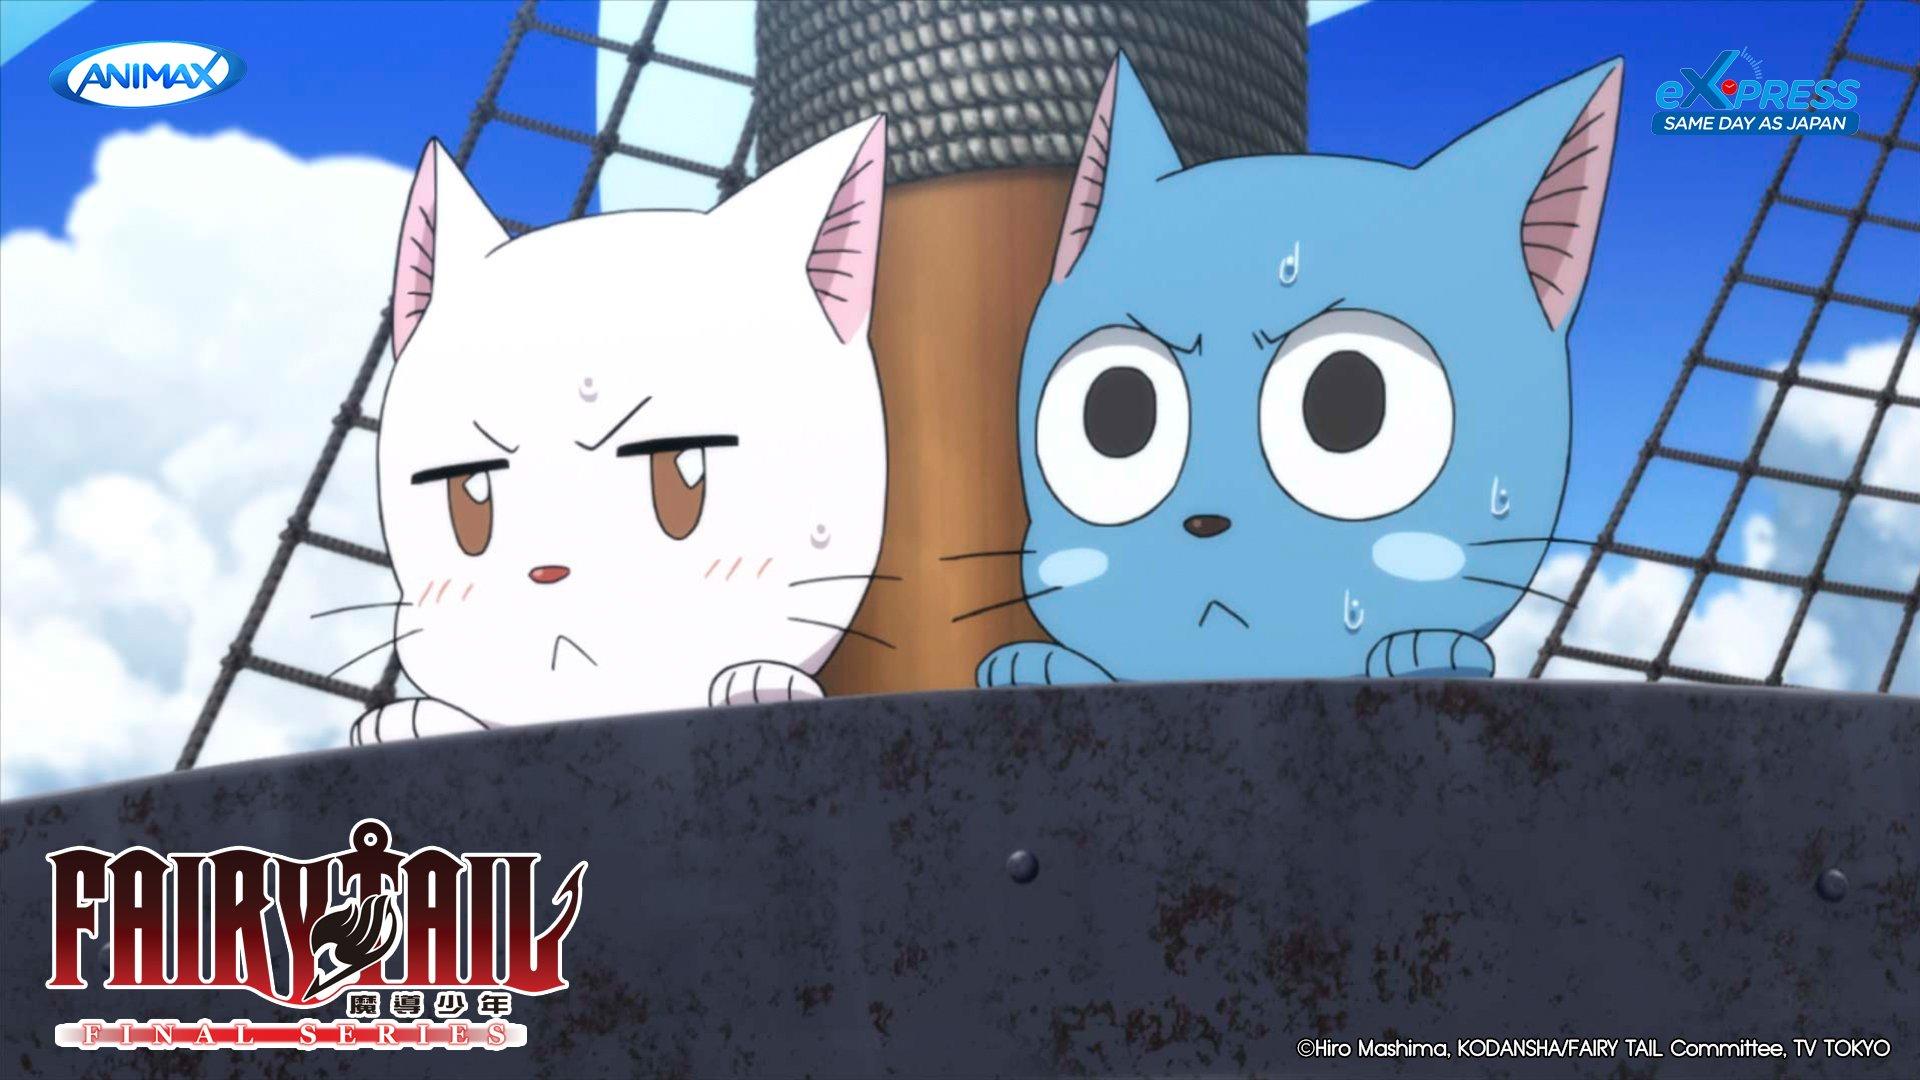 Animax Asia |